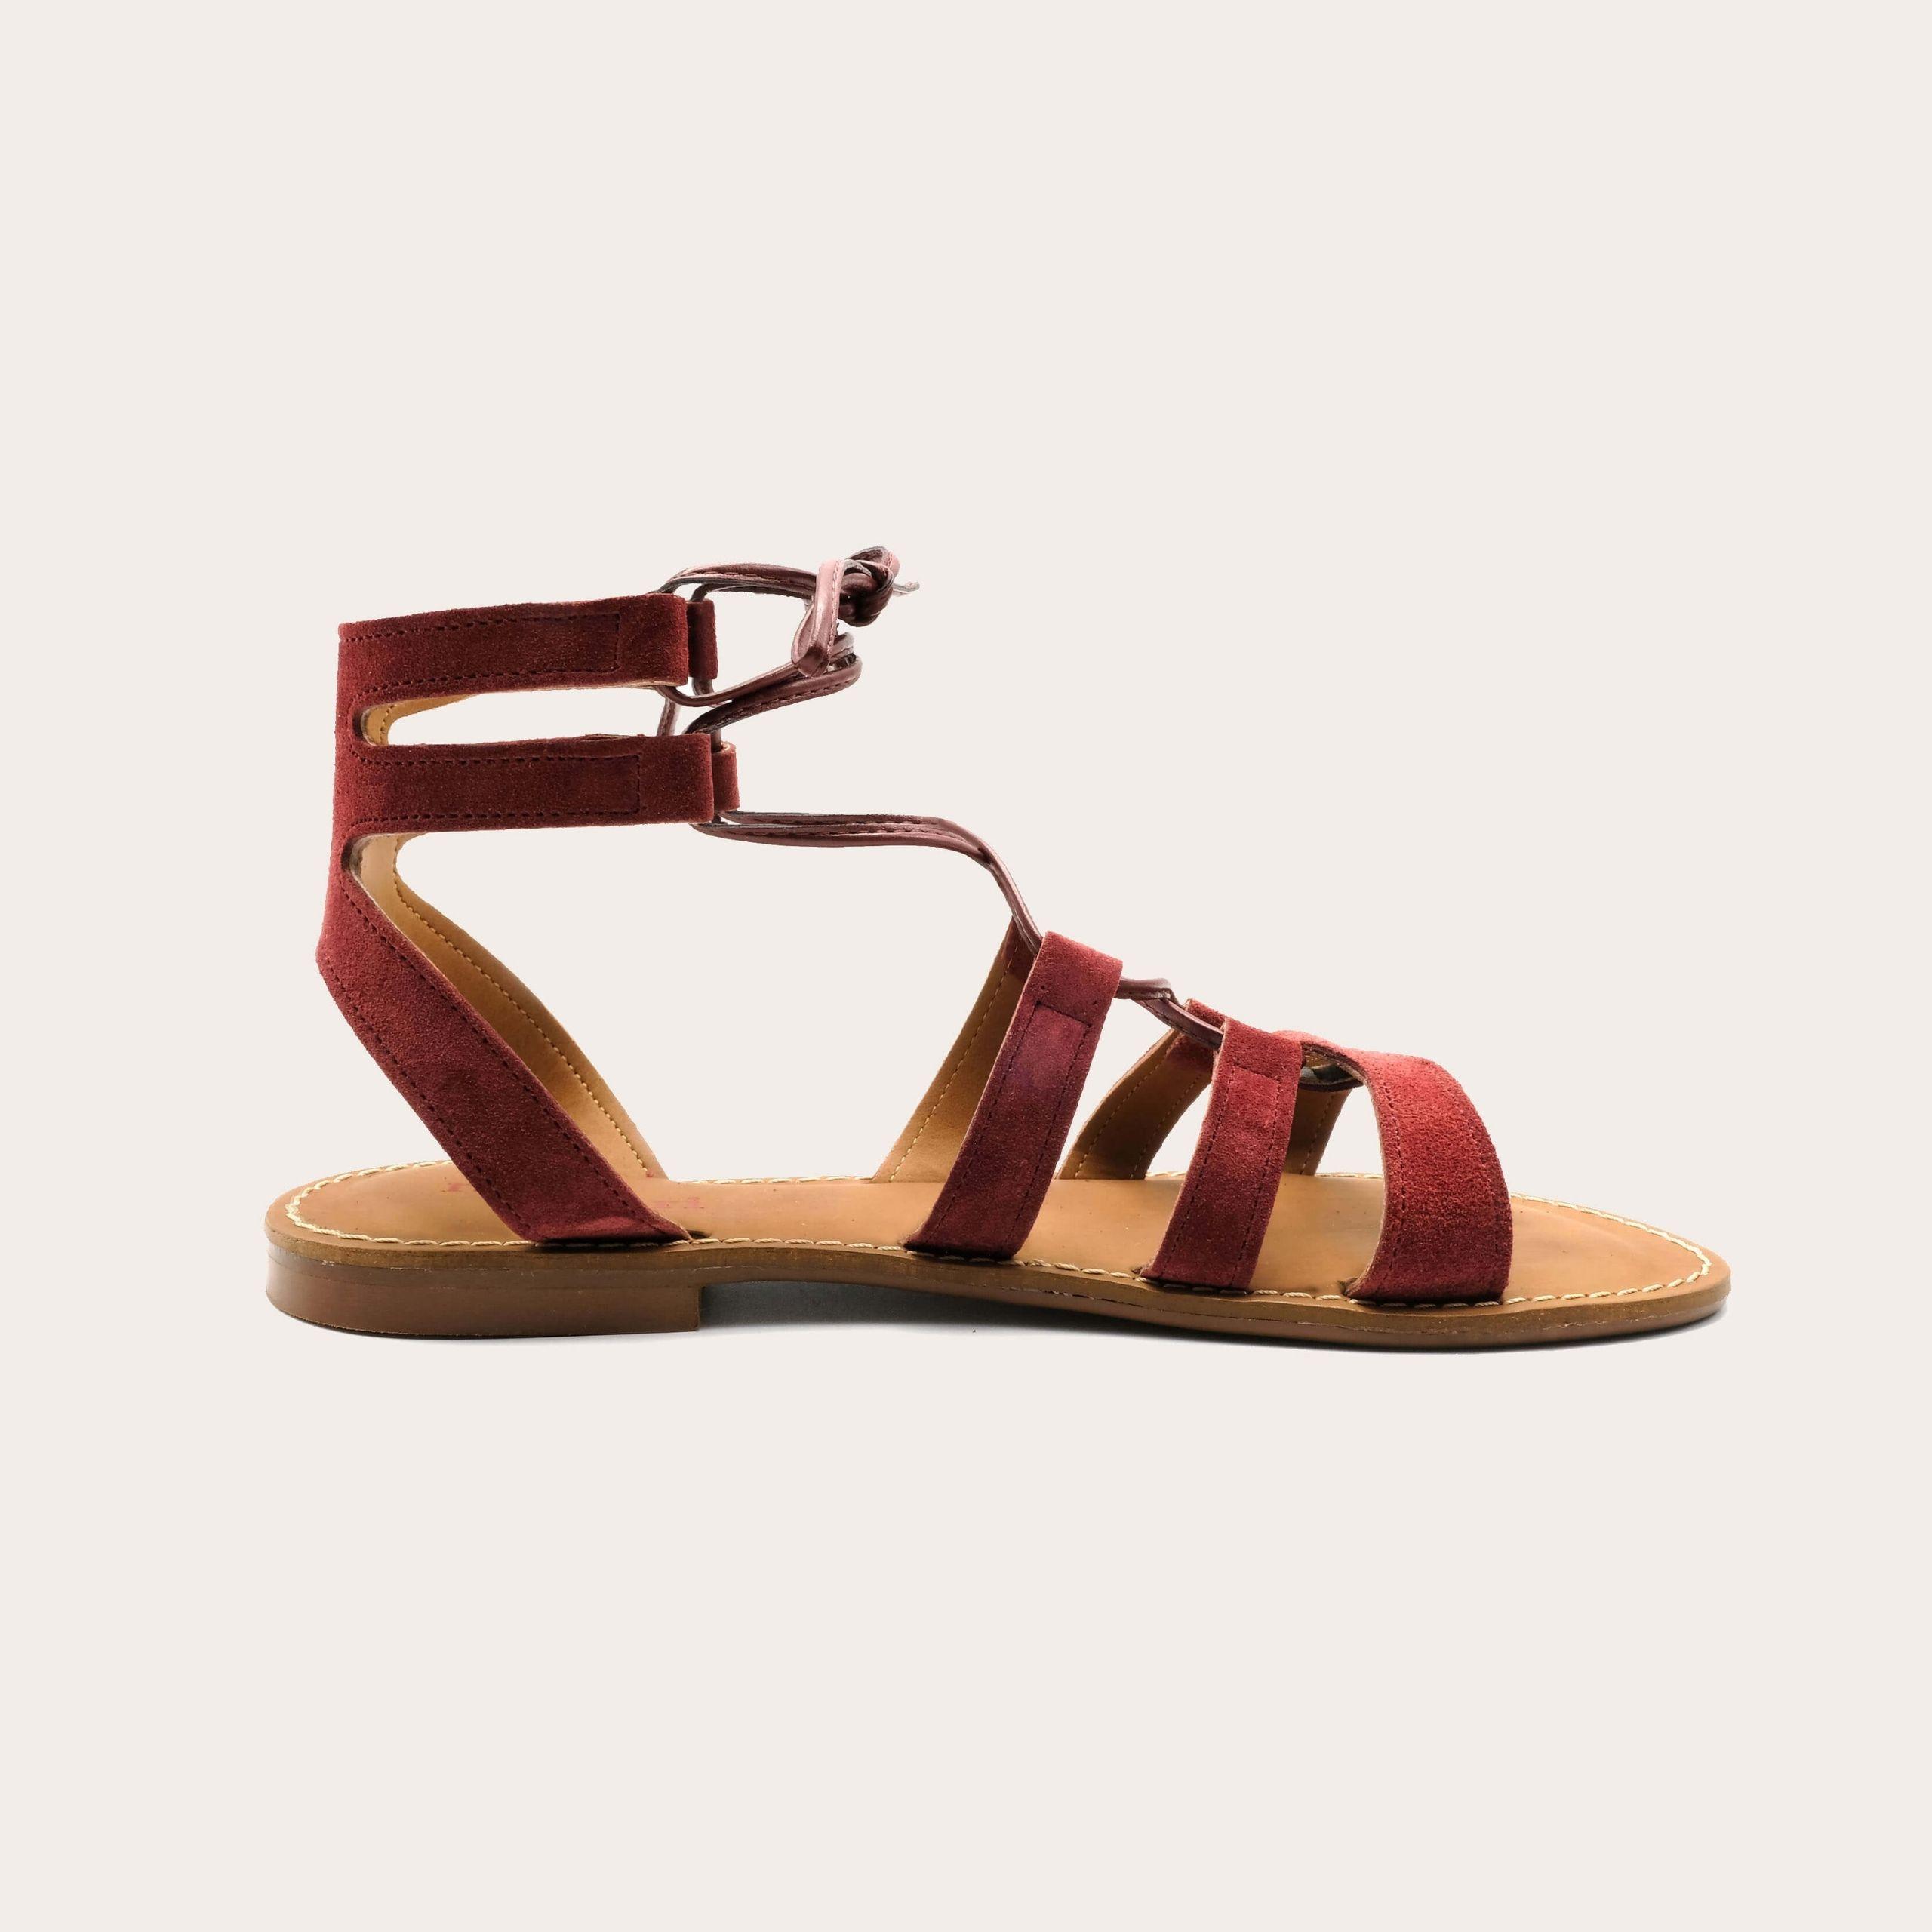 fe-terra-lintsandalen sandals travelsandals vegan sustainable sandals wikkelsandalen